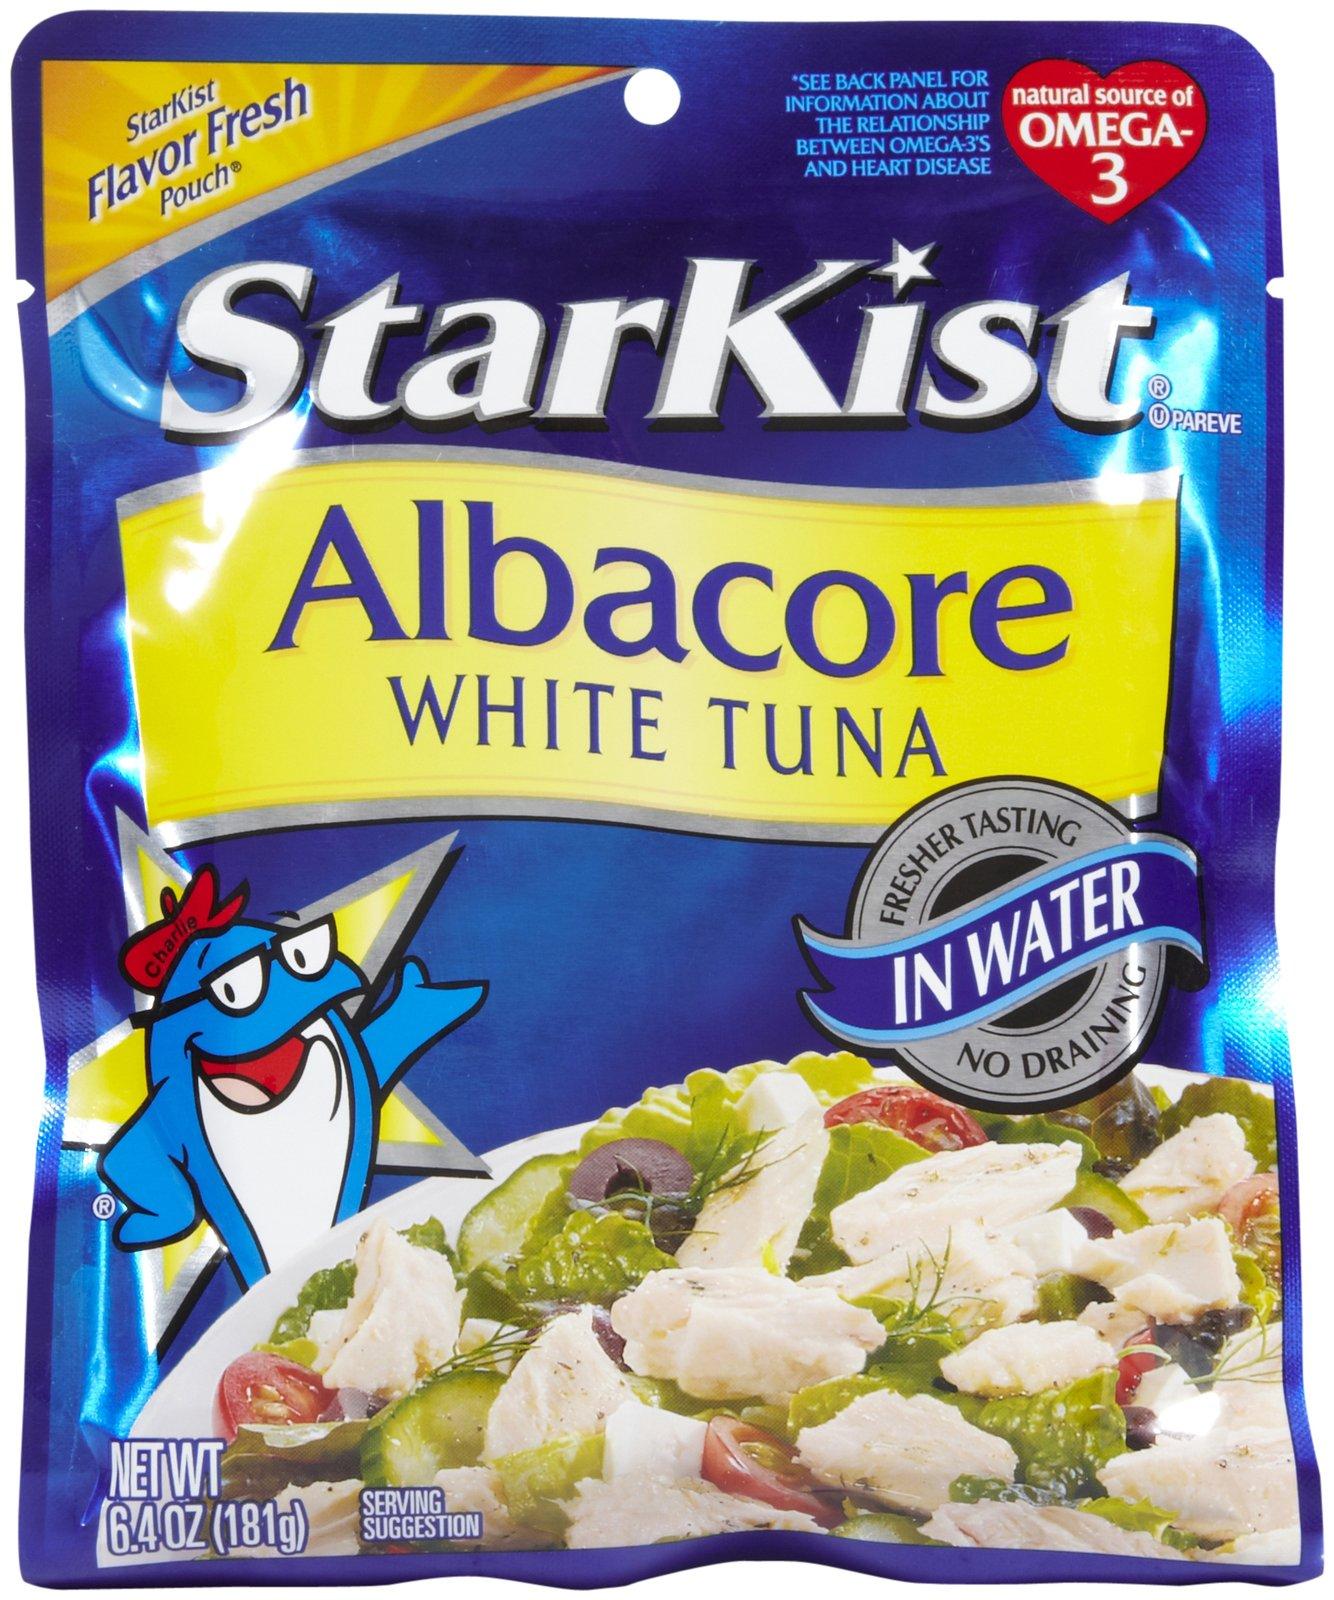 Starkist Albacore White Tuna Only 1 30